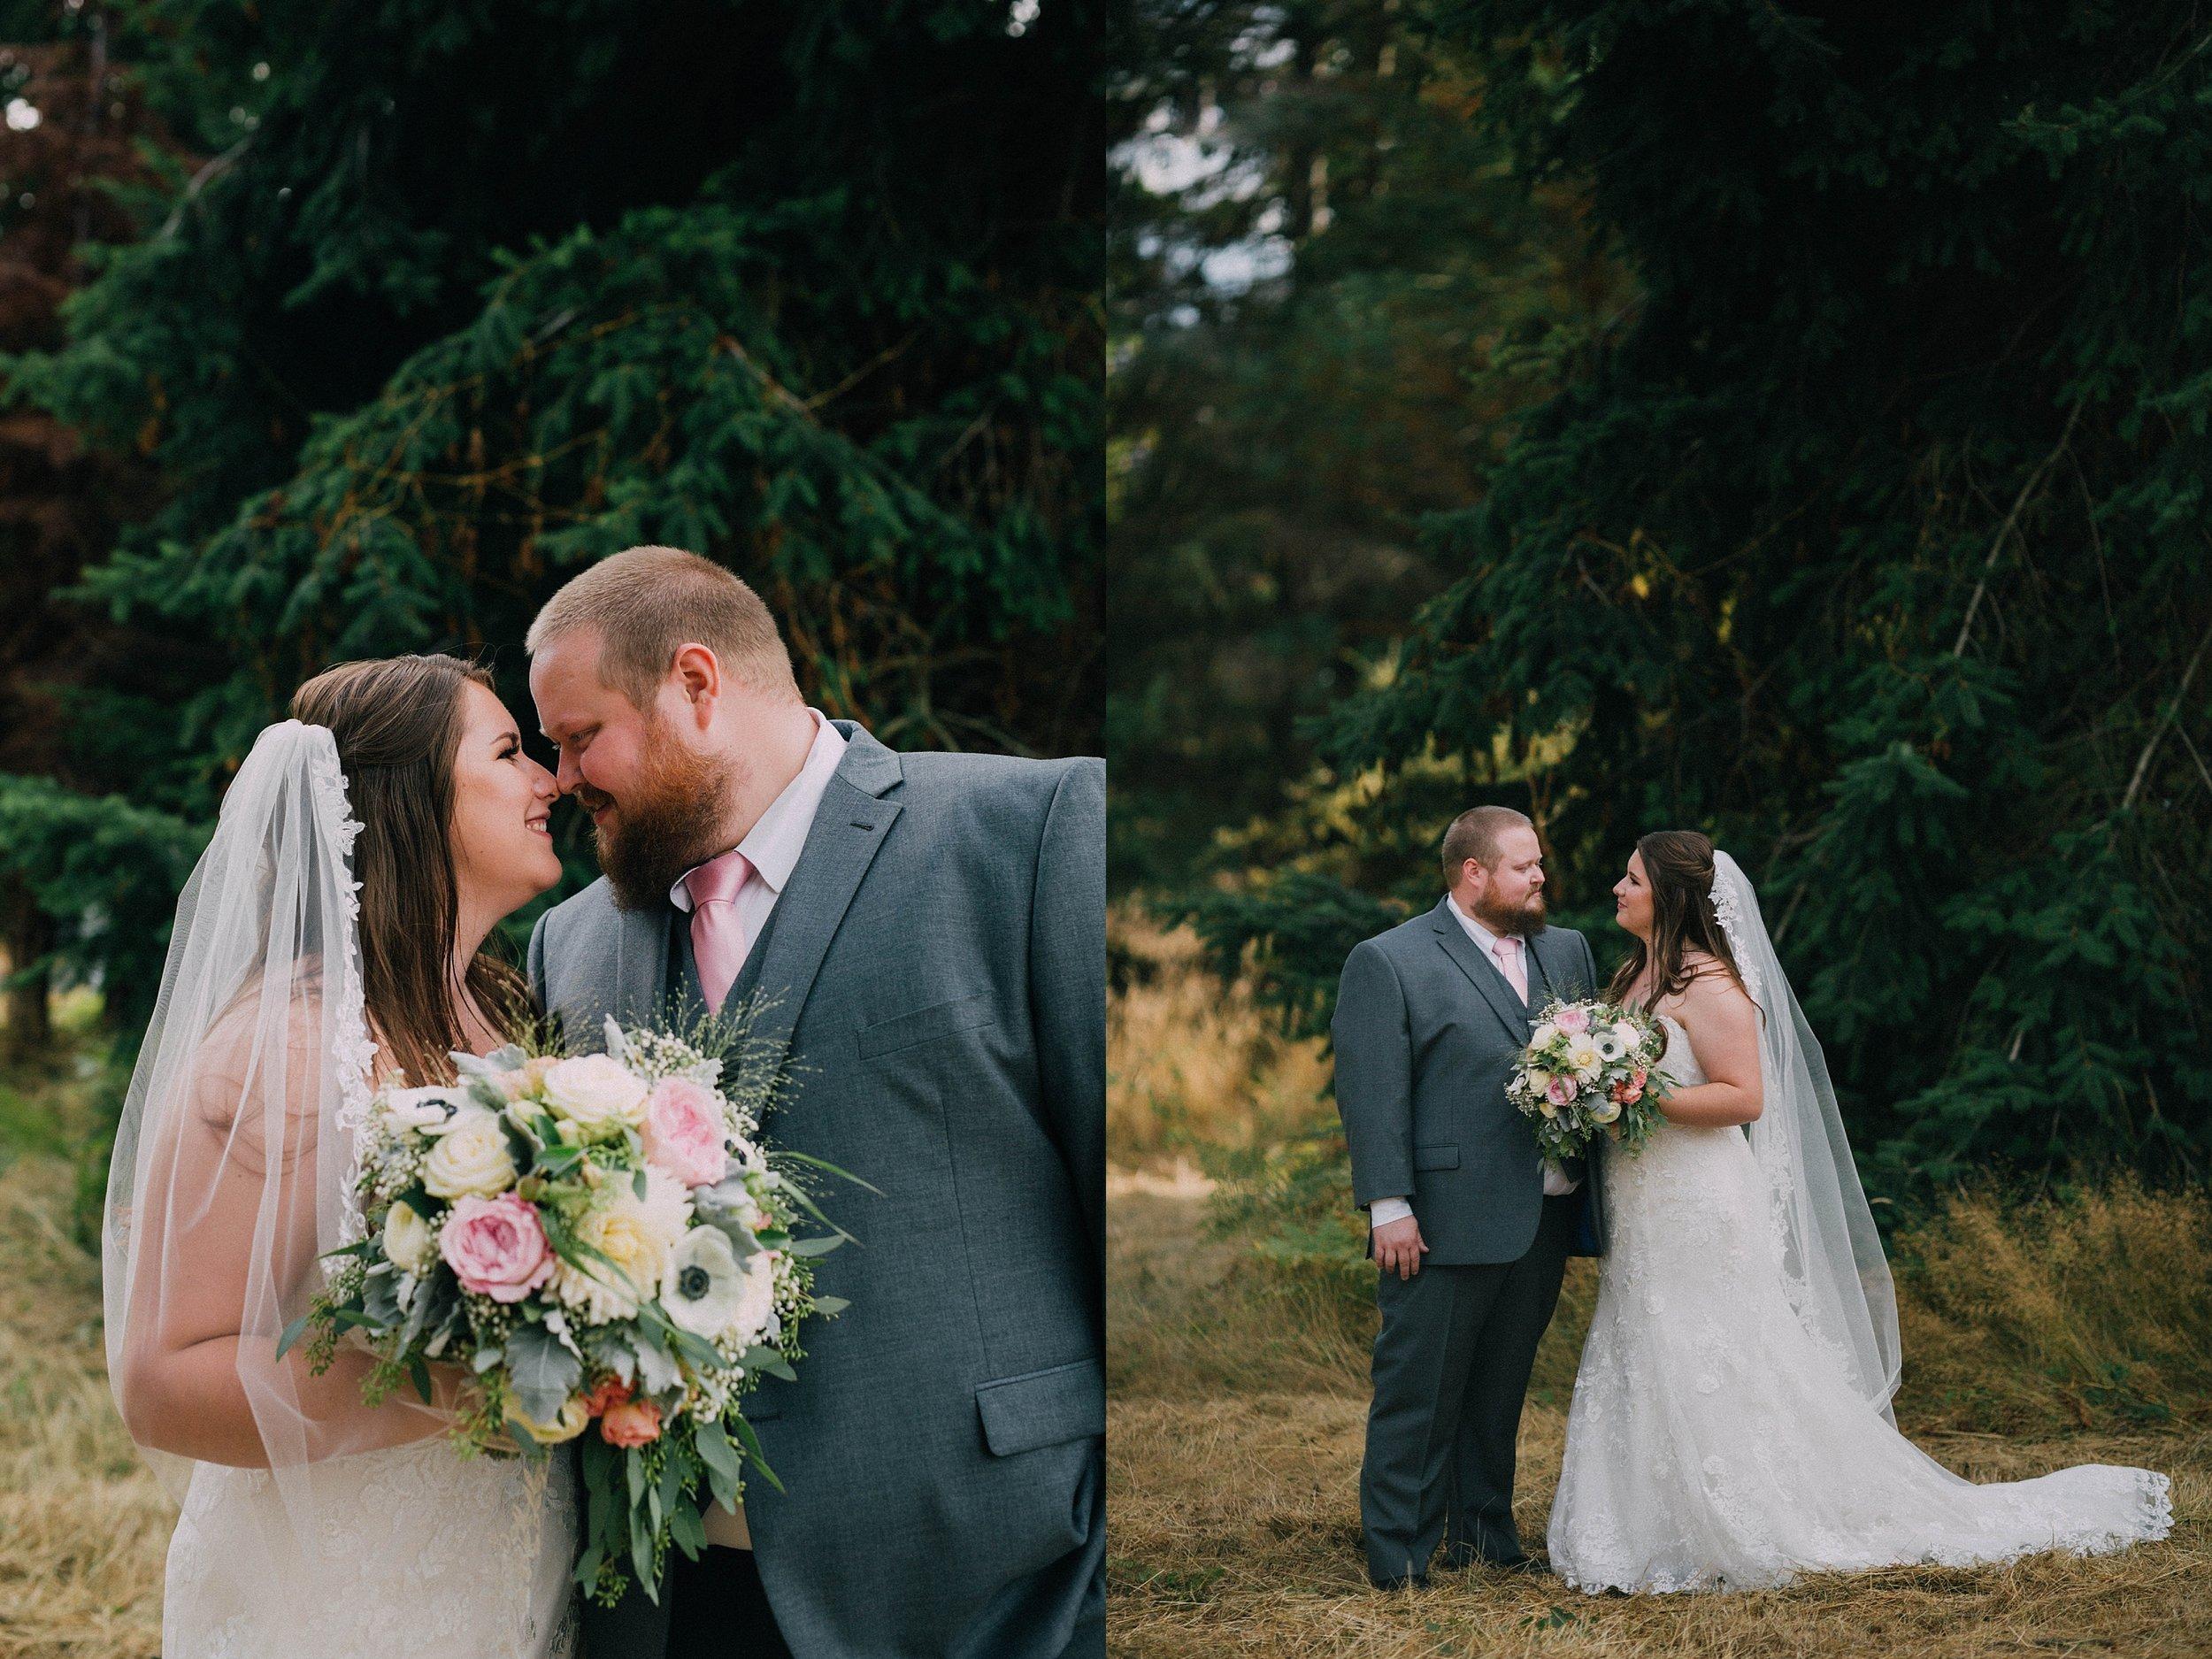 karisa ryan - vashon island backyard wedding photographer - seattle area backyard wedding photography - ashley vos-22.jpg